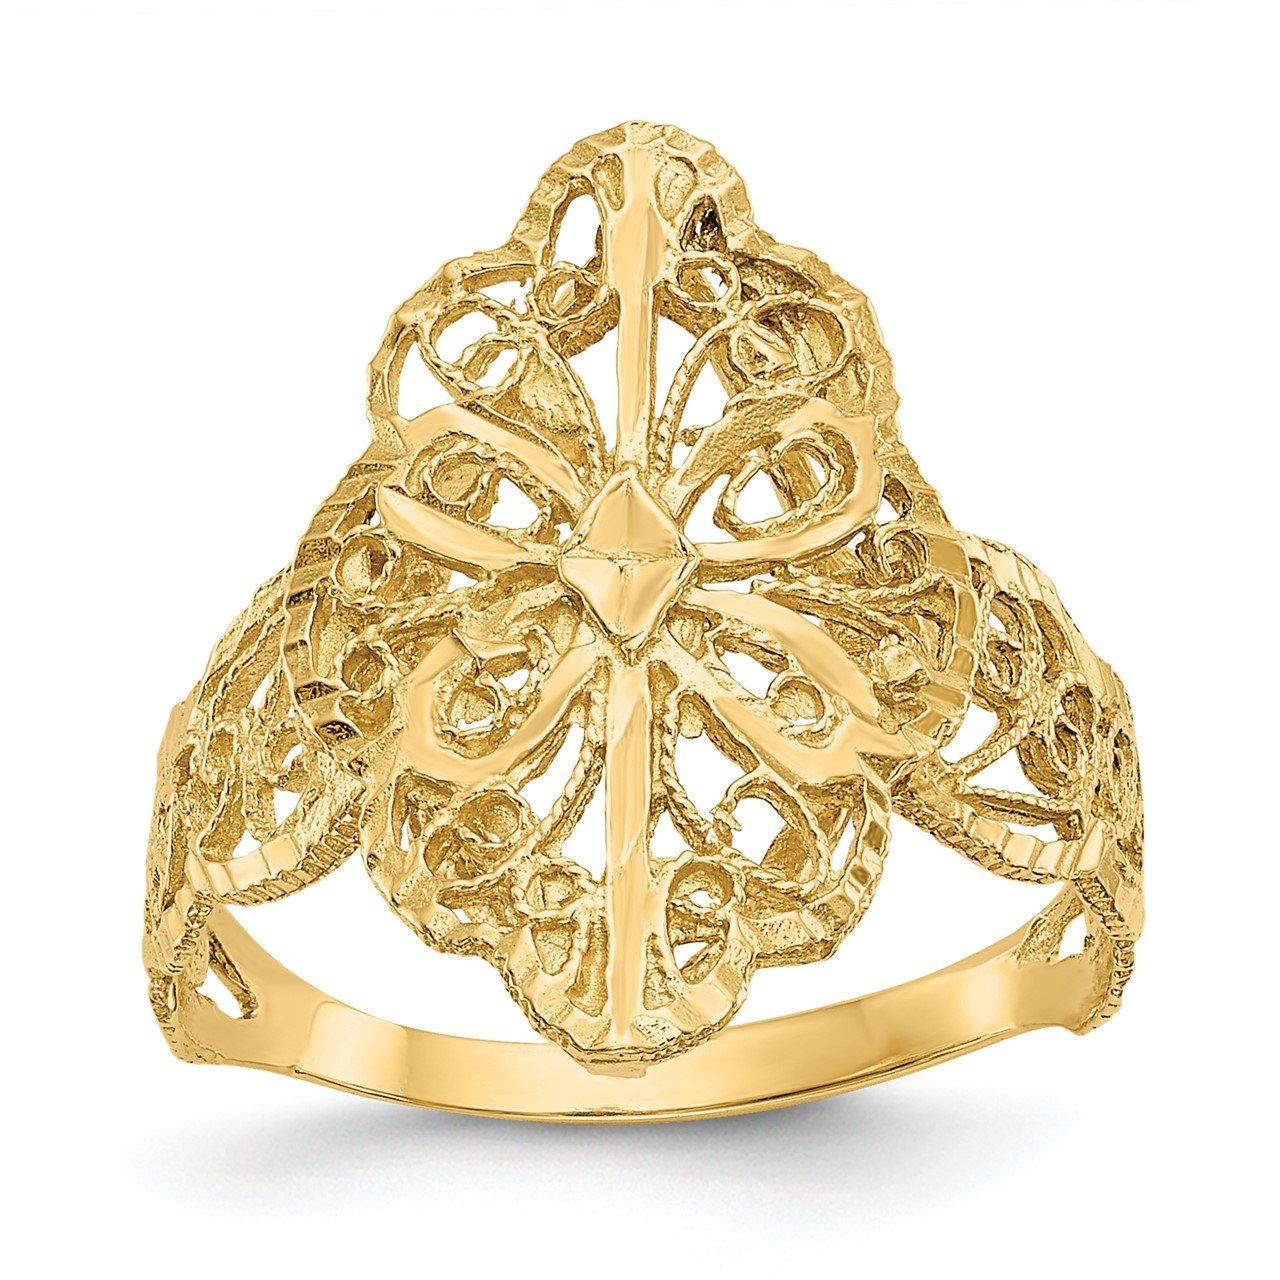 14K Diamond Cut Filigree Ring